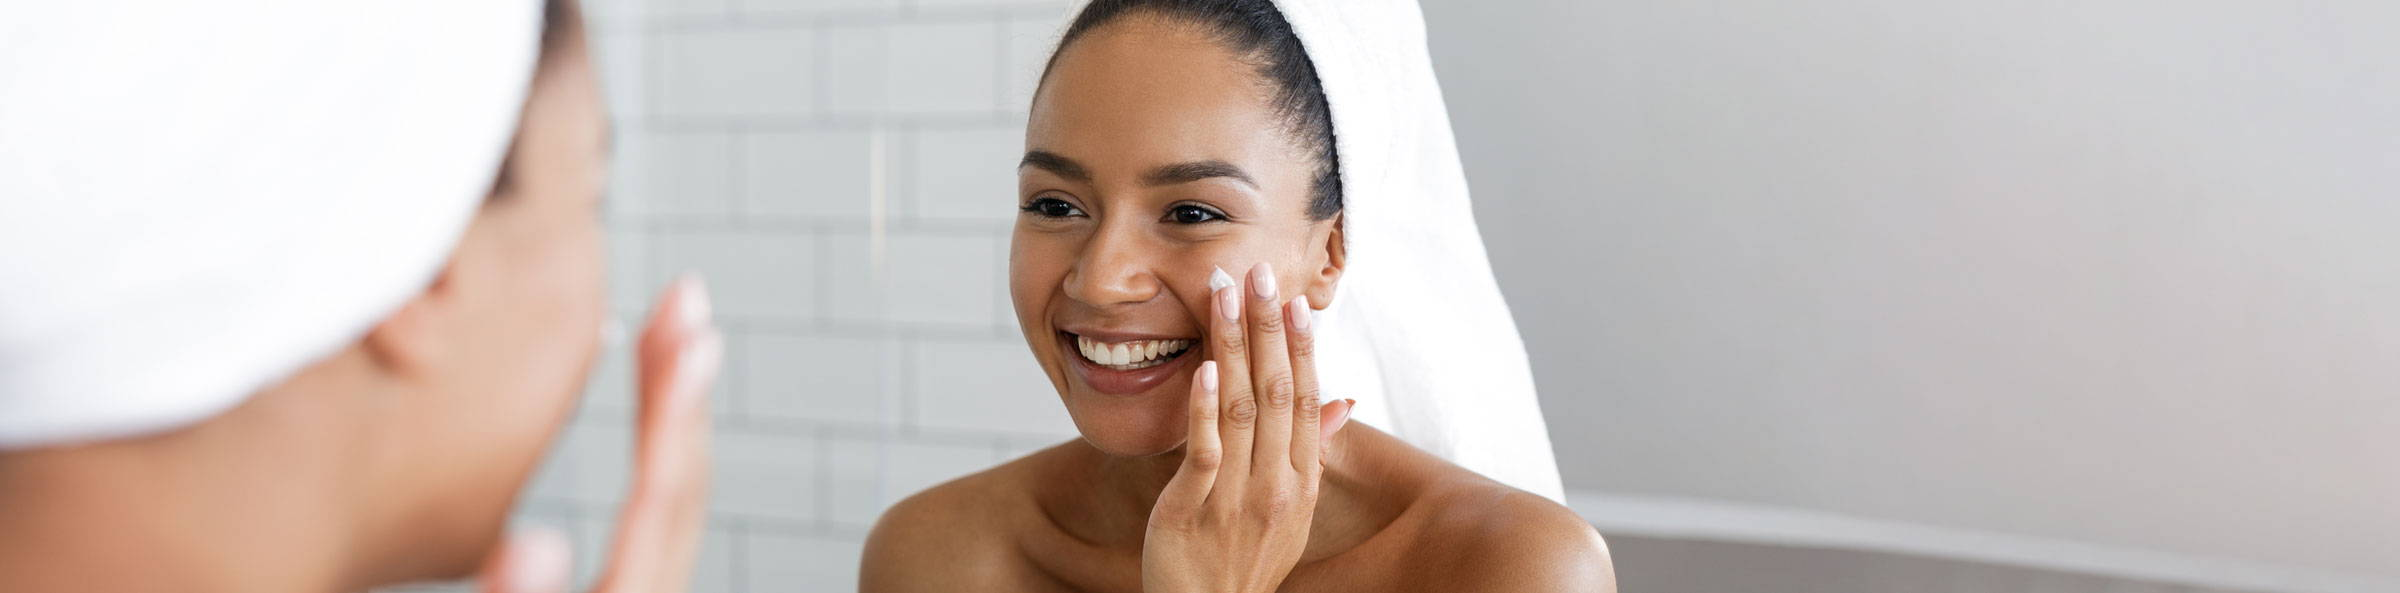 Explore our Skincare range